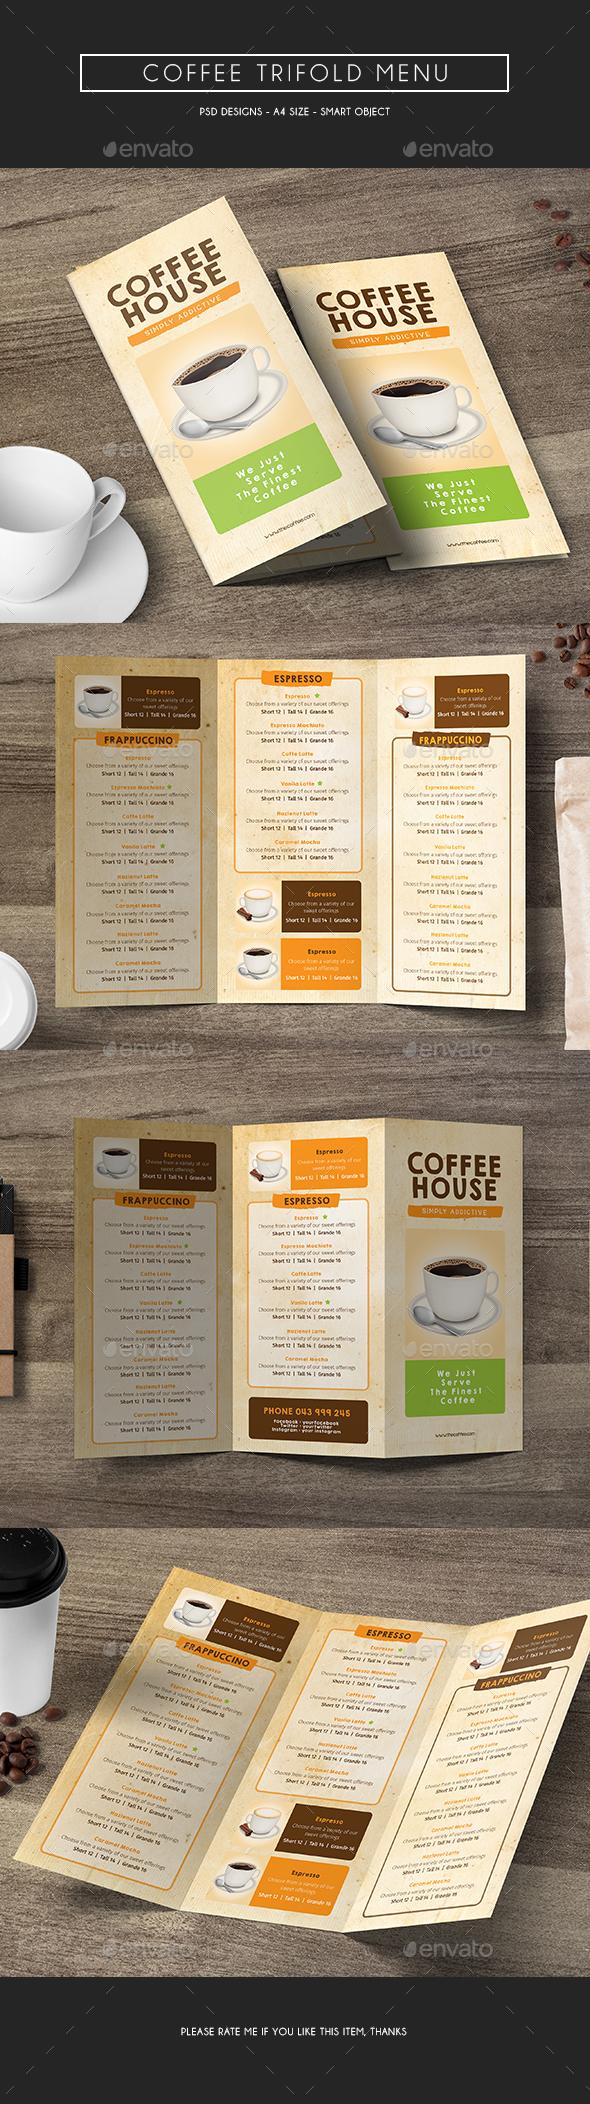 Coffee Trifold Menu - Food Menus Print Templates